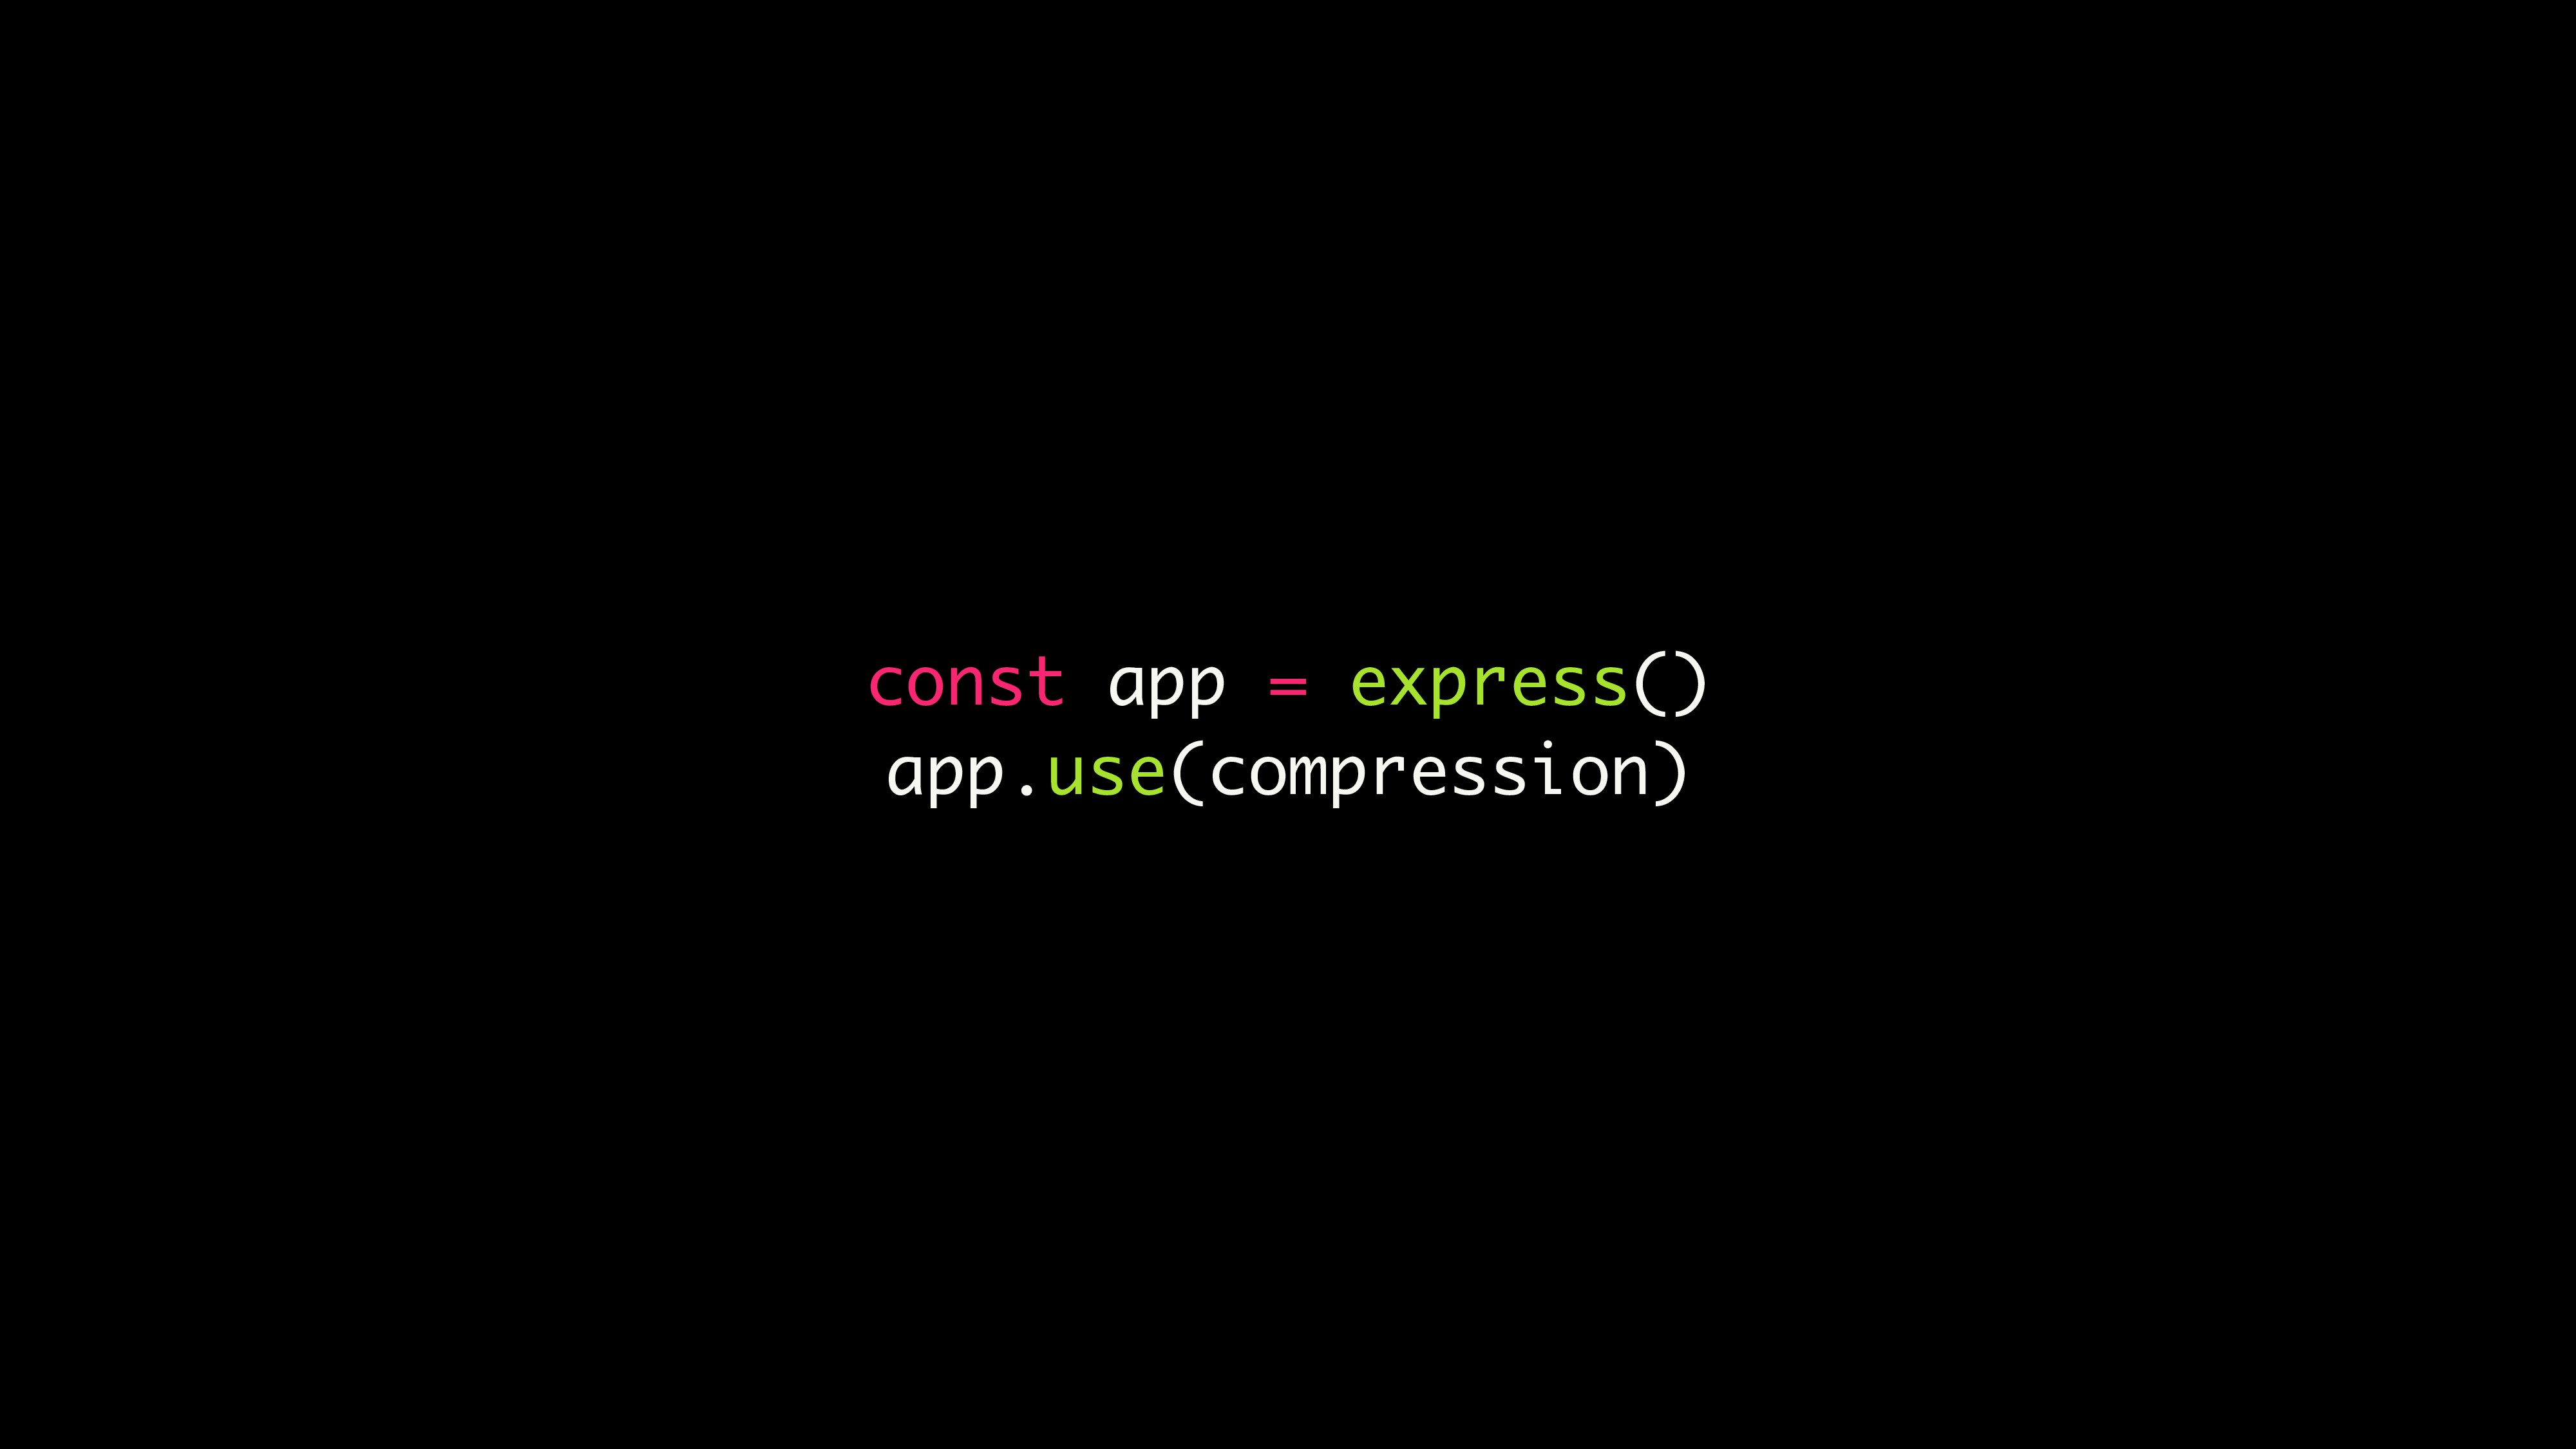 const app = express() app.use(compression)